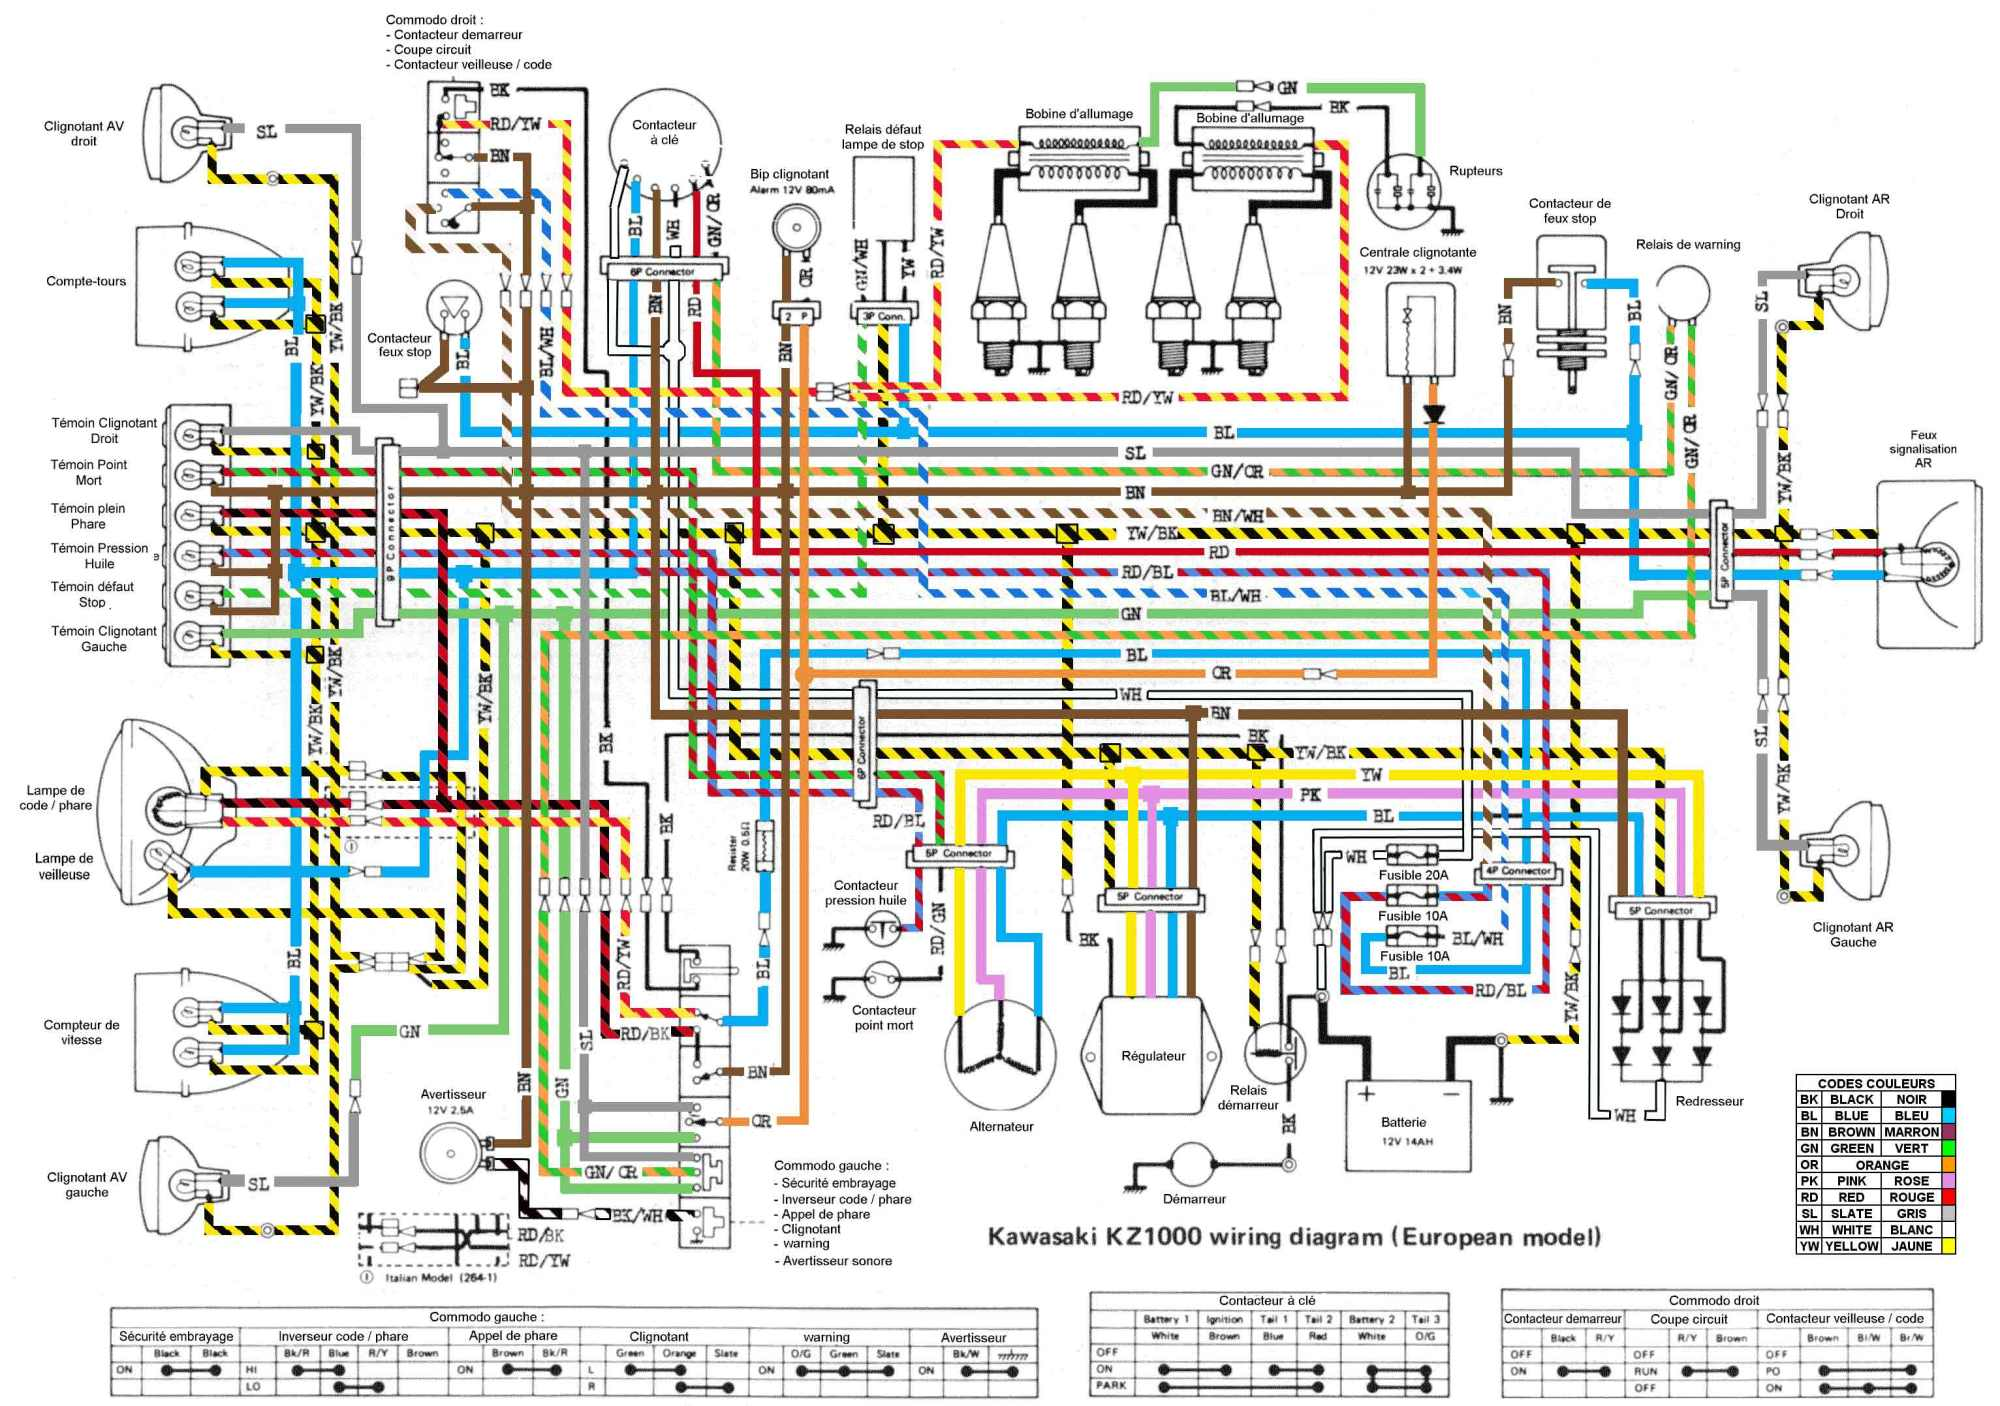 hight resolution of z1000 wiring diagram wiring diagramskawasaki z1000 a1 wiring diagram wiring diagram centre 2010 kawasaki z1000 wiring